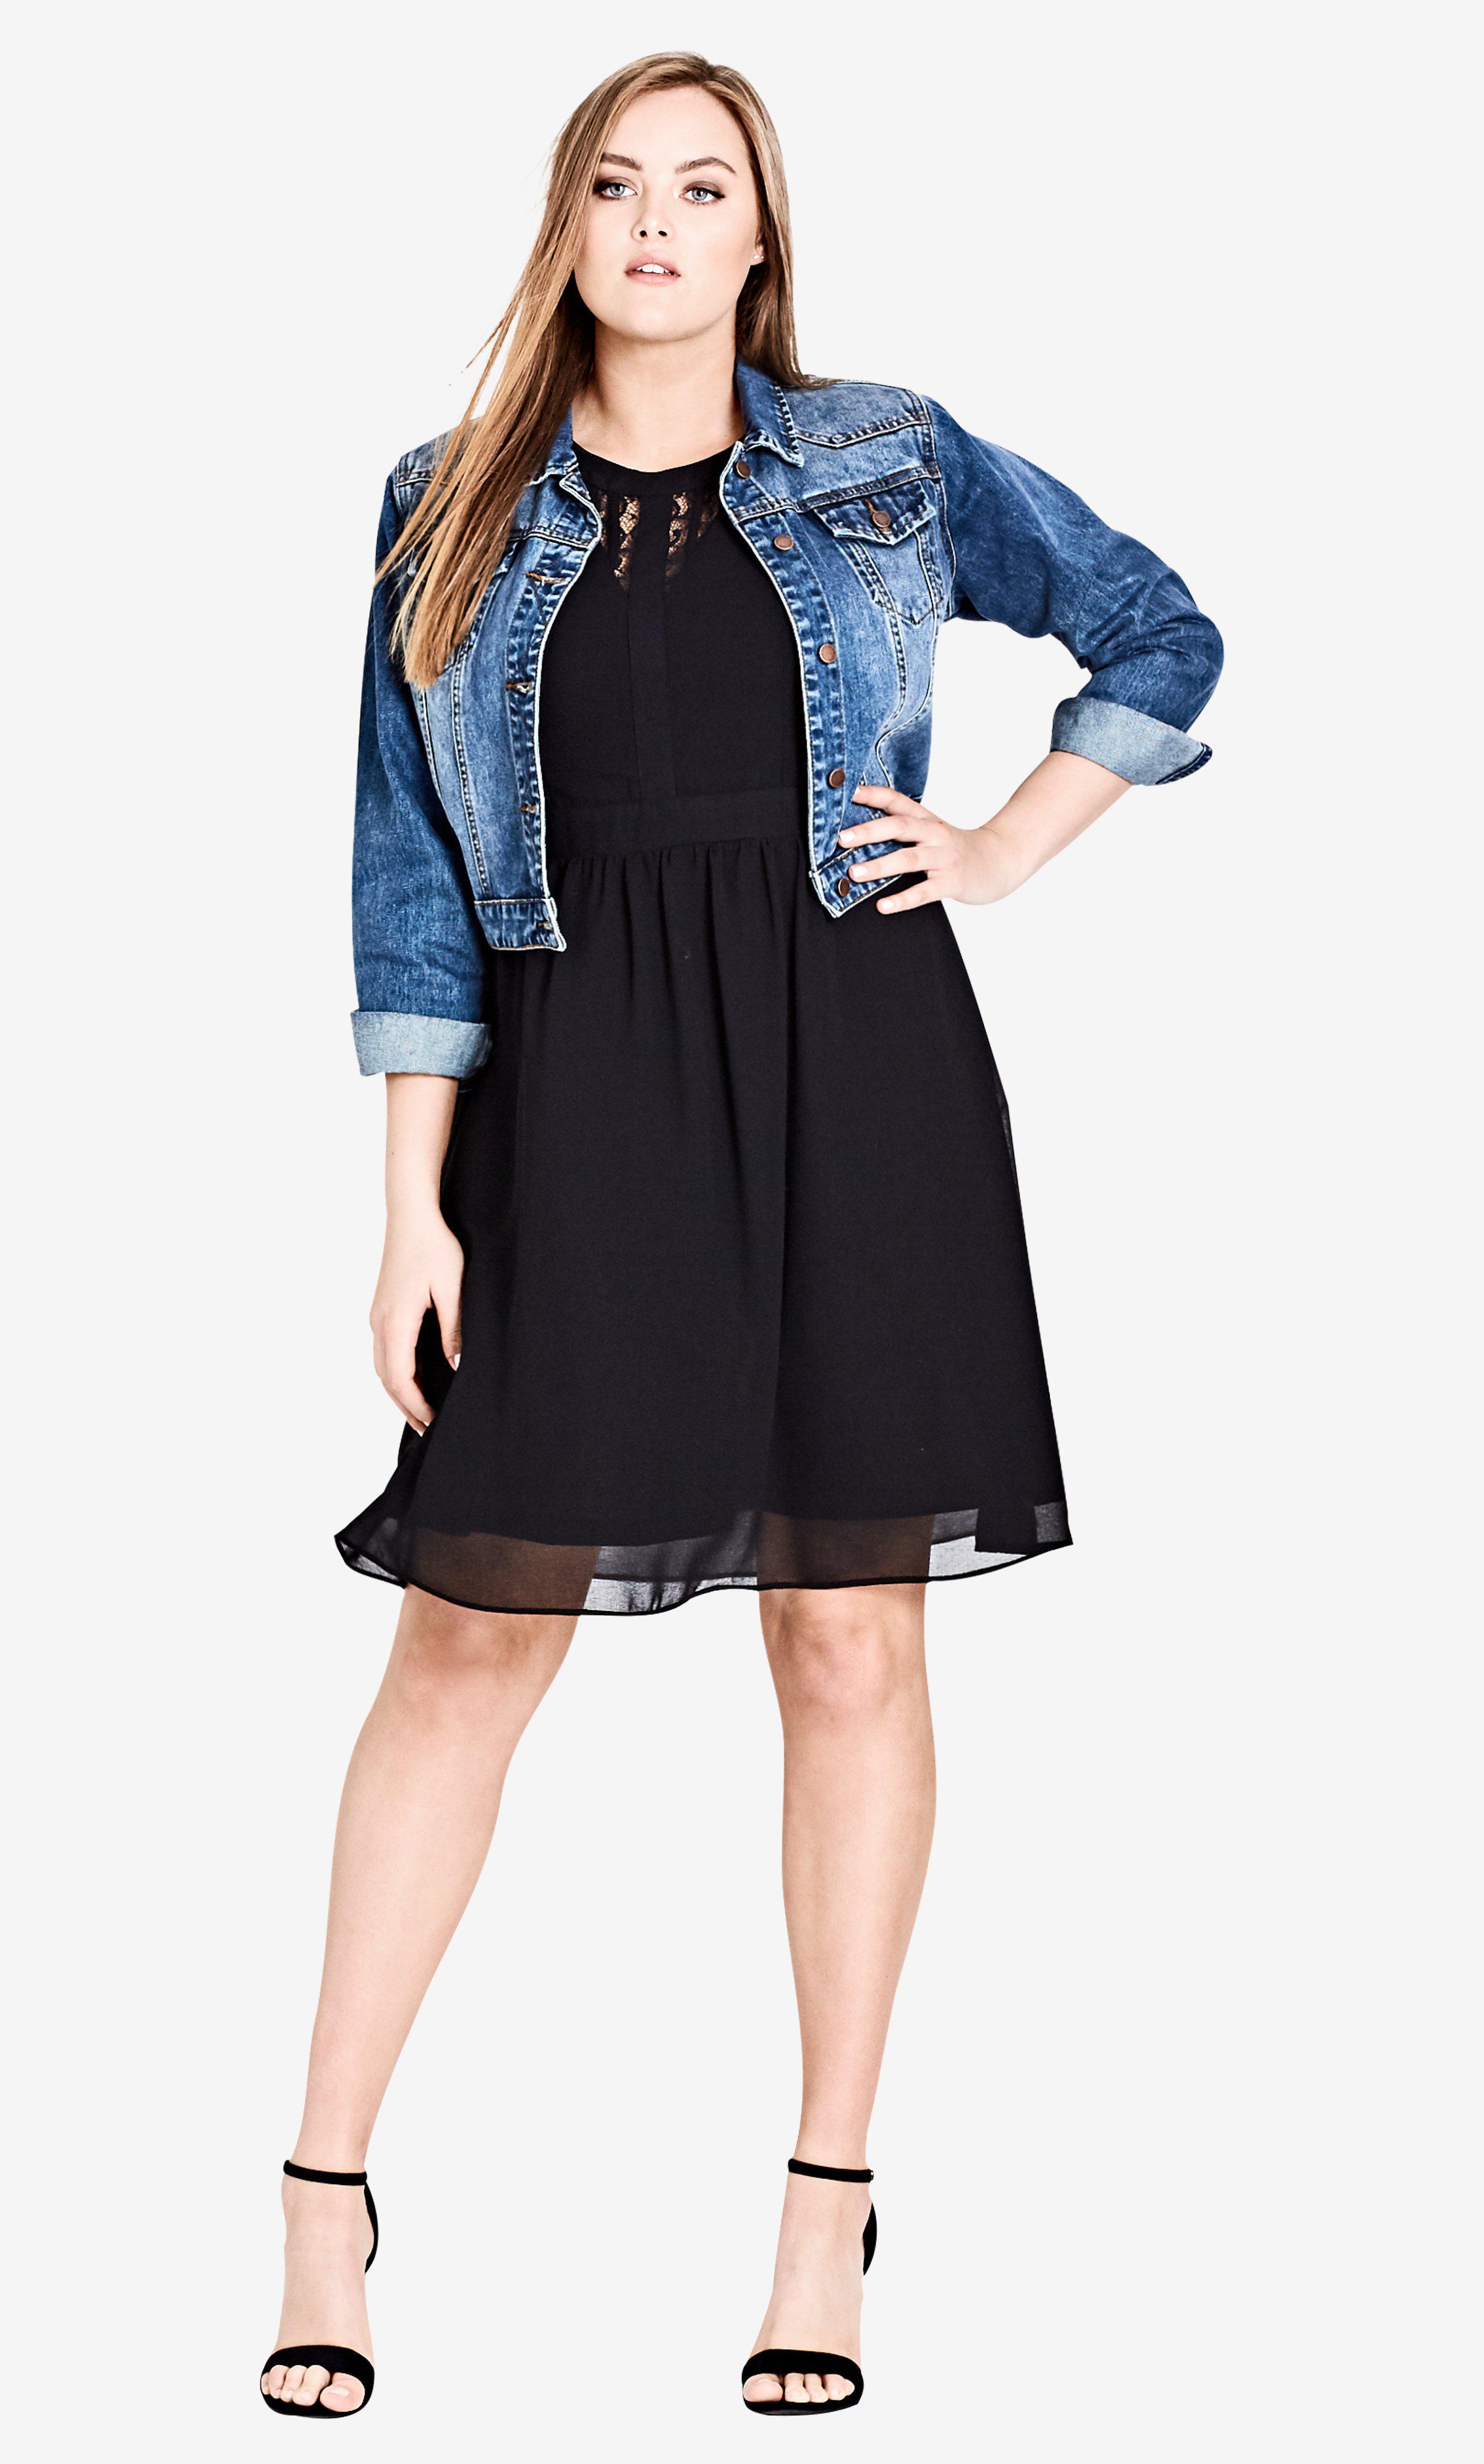 261a026681 Lyst - City Chic Dark Romance Fit   Flare Dress - Black in Black